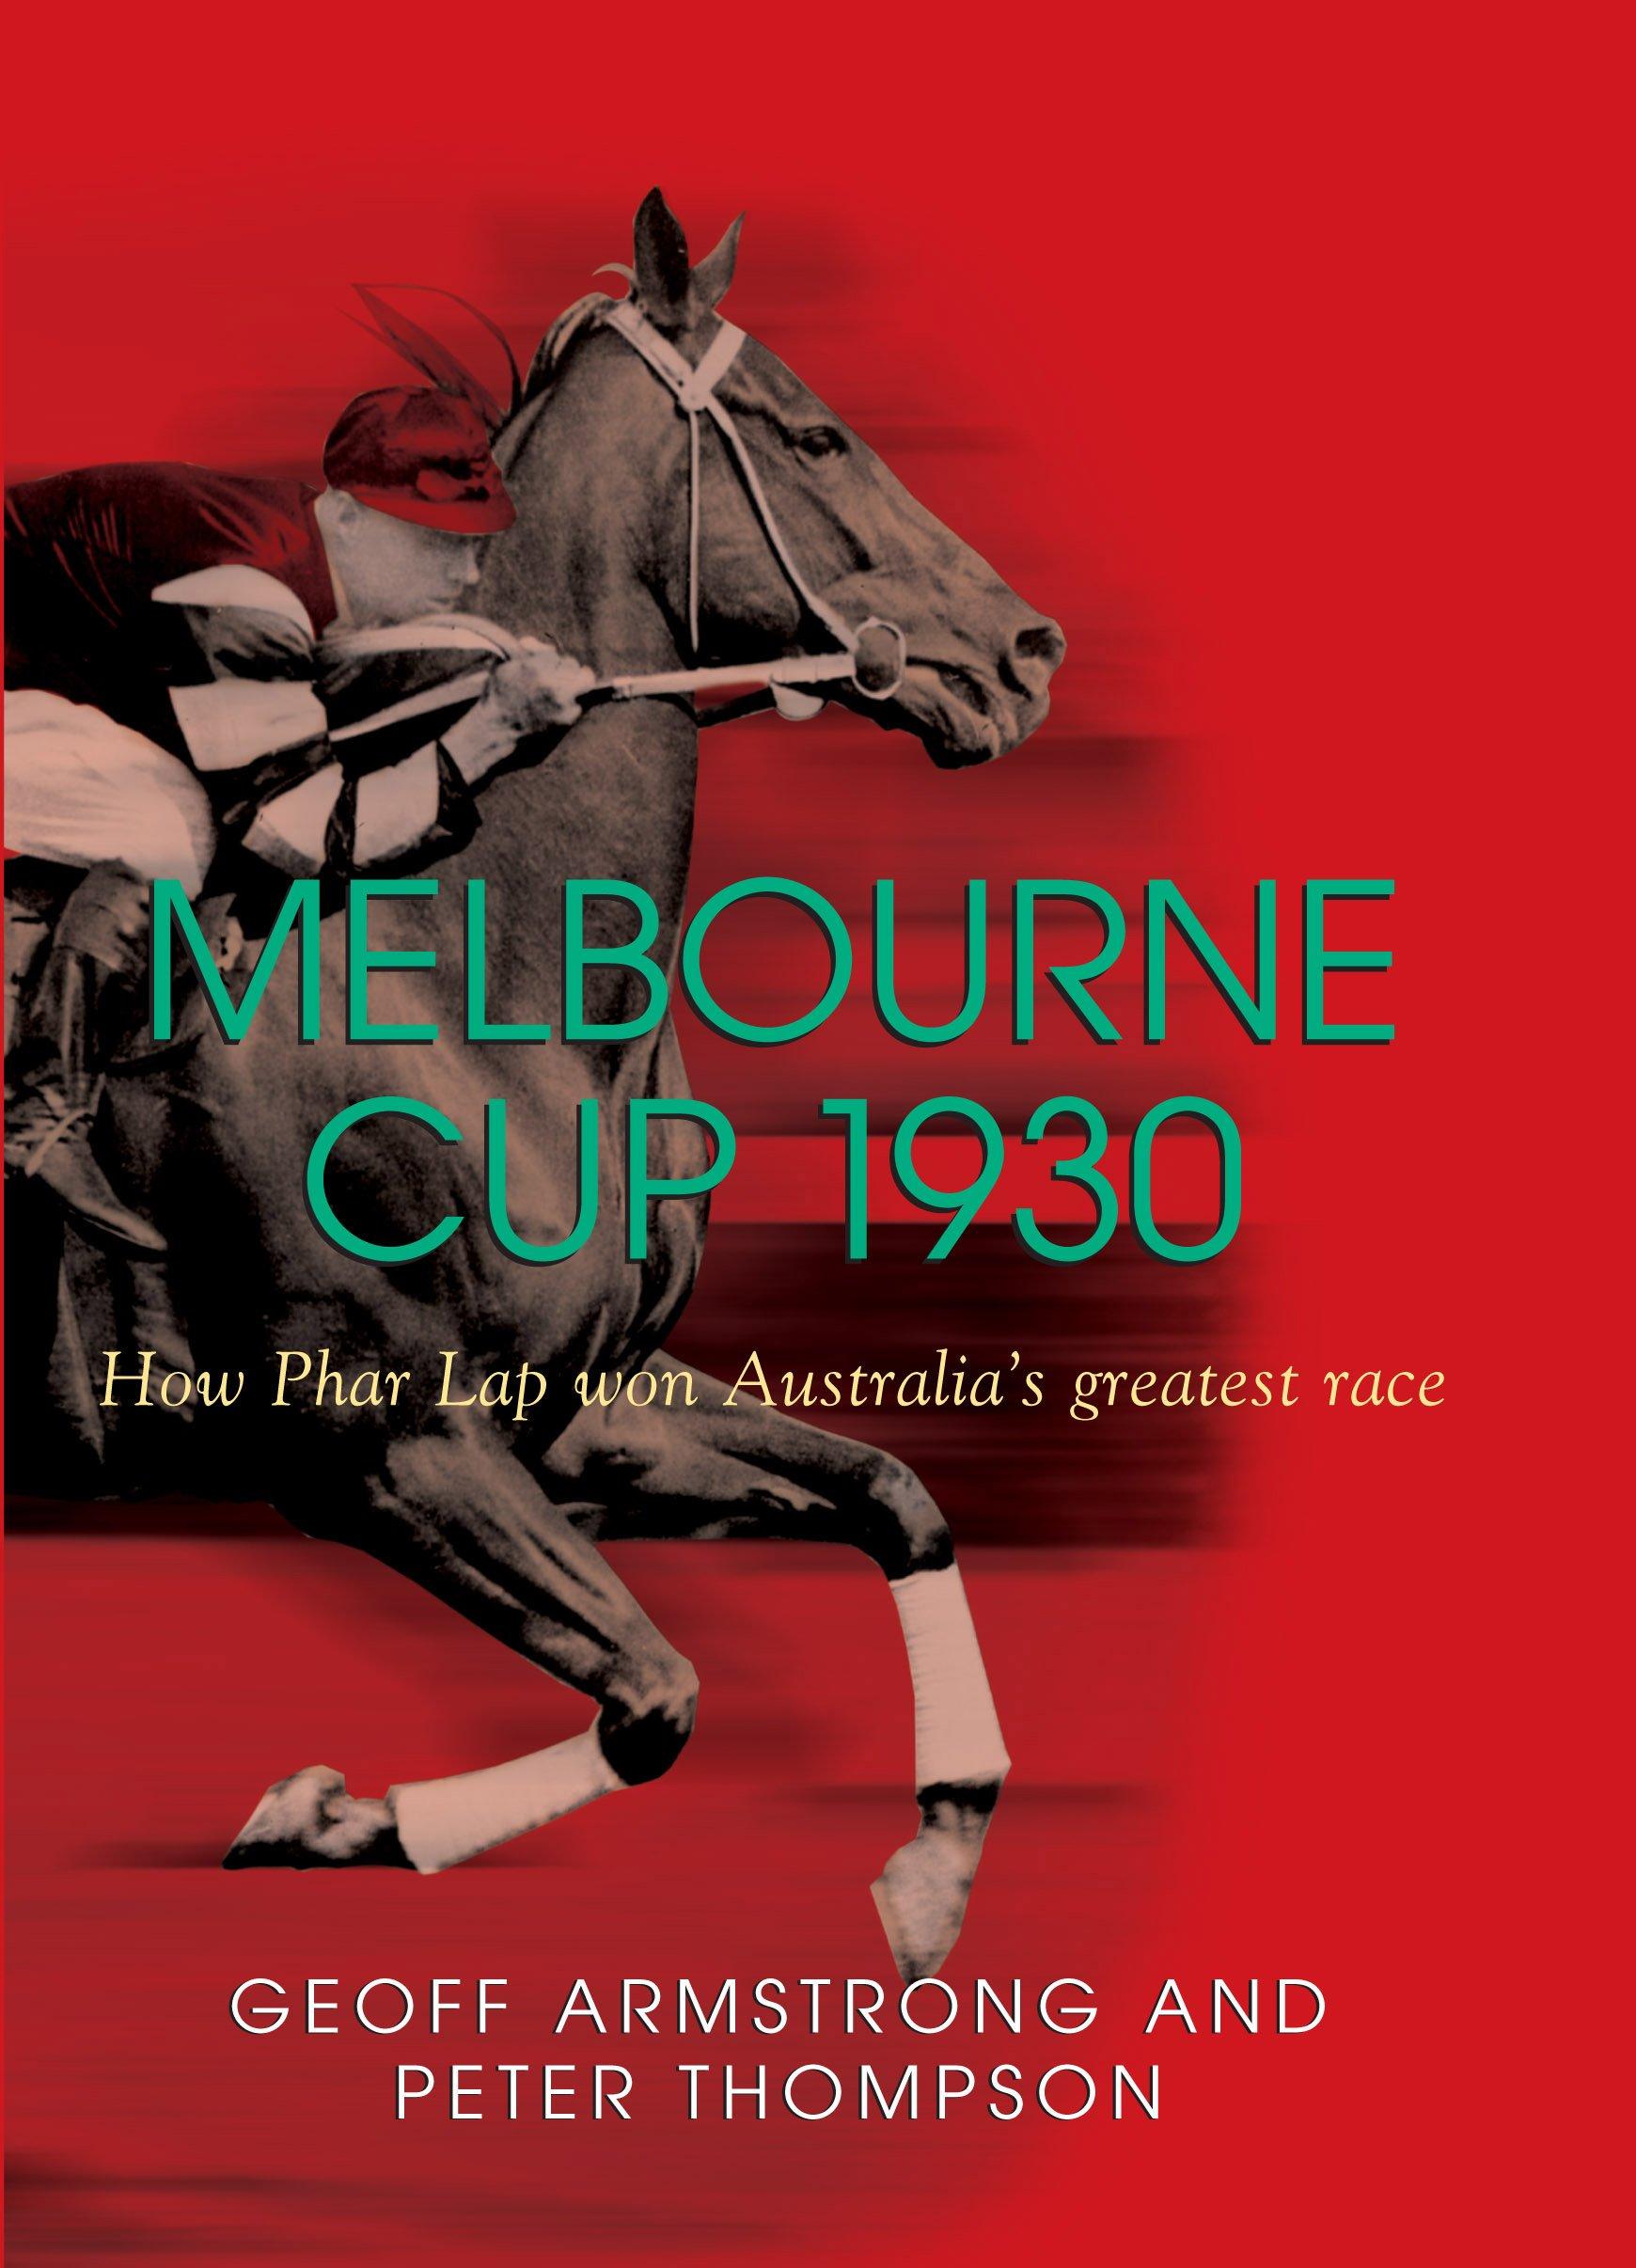 Melbourne Cup 1930: How Phar Lap Won Australia's Greatest